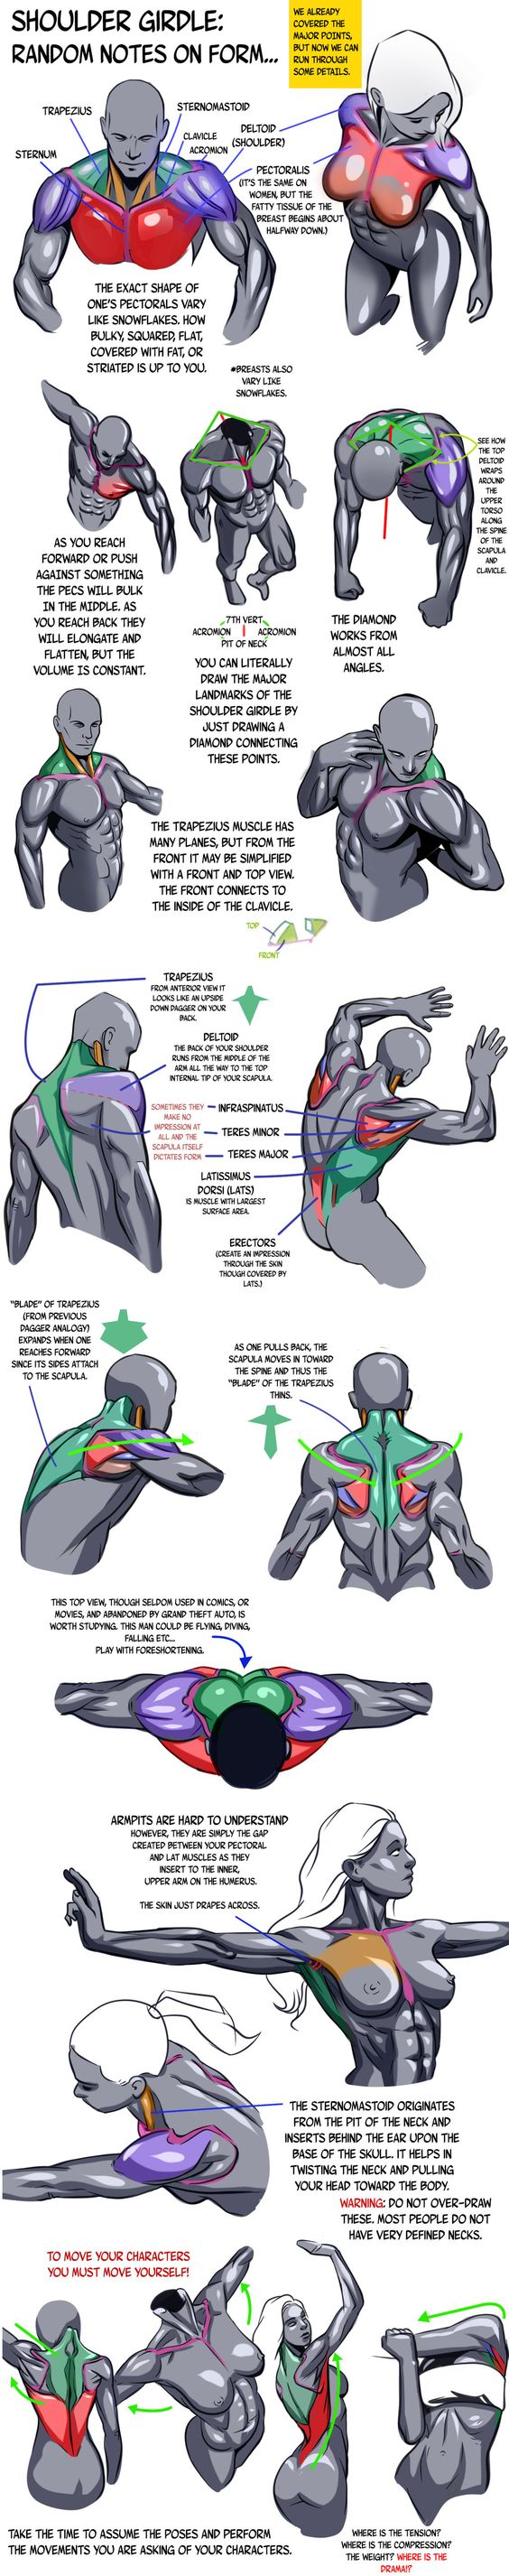 https://www.pinterest.ie/characterdesigh/character-anatomy-shoulder/